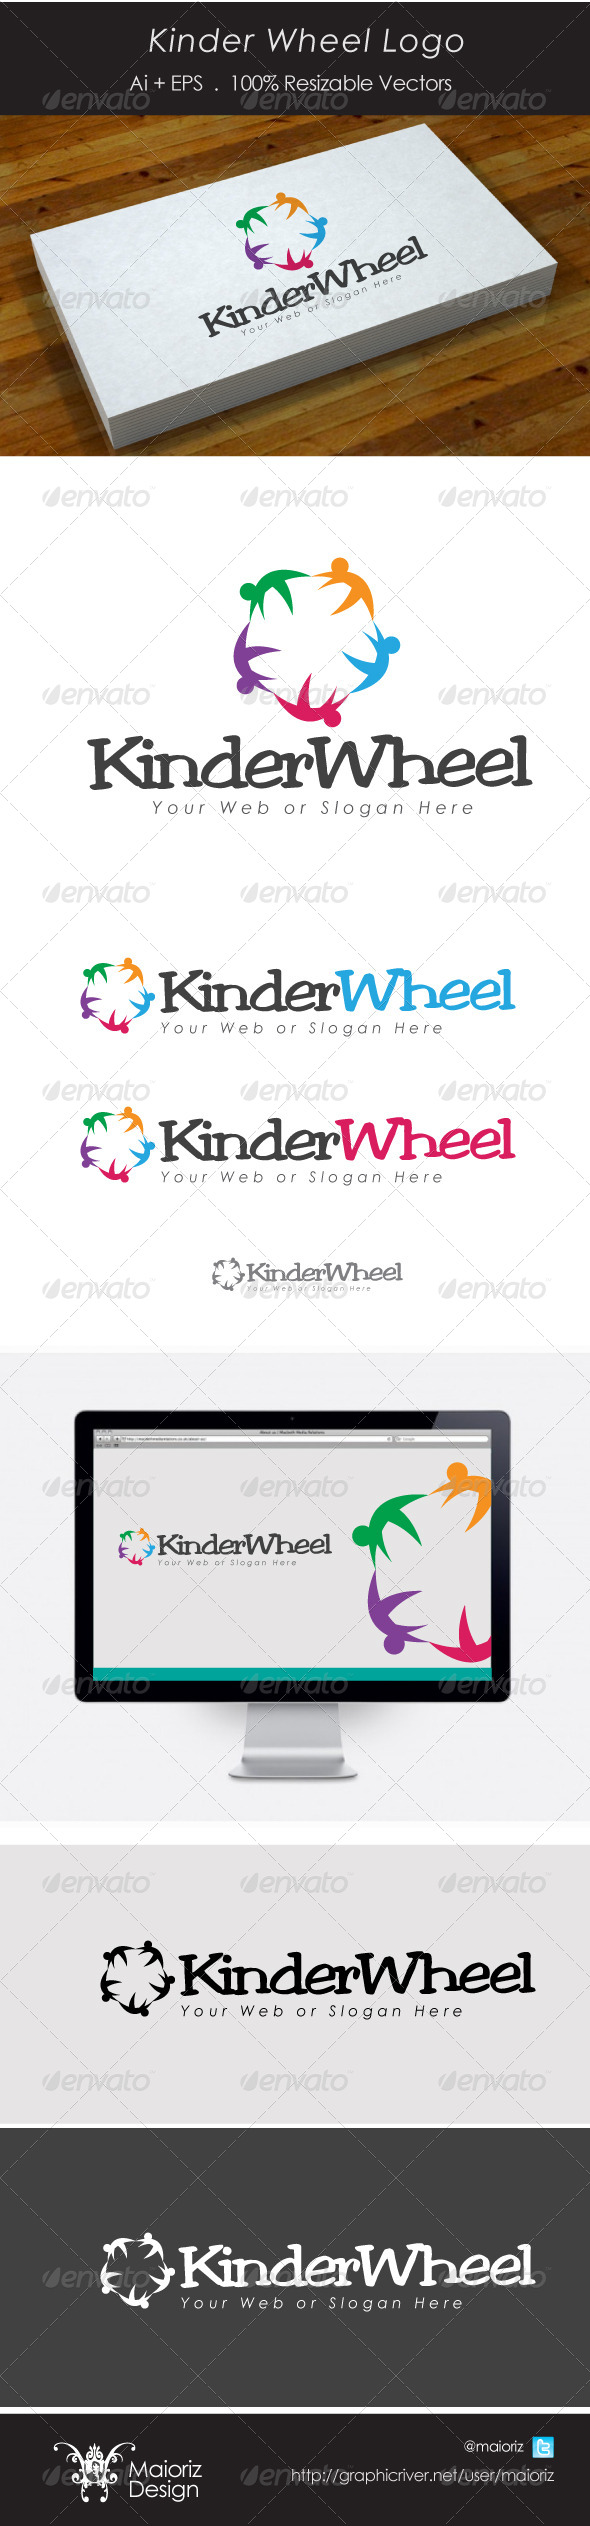 GraphicRiver Kinder Wheel Logo 4328069